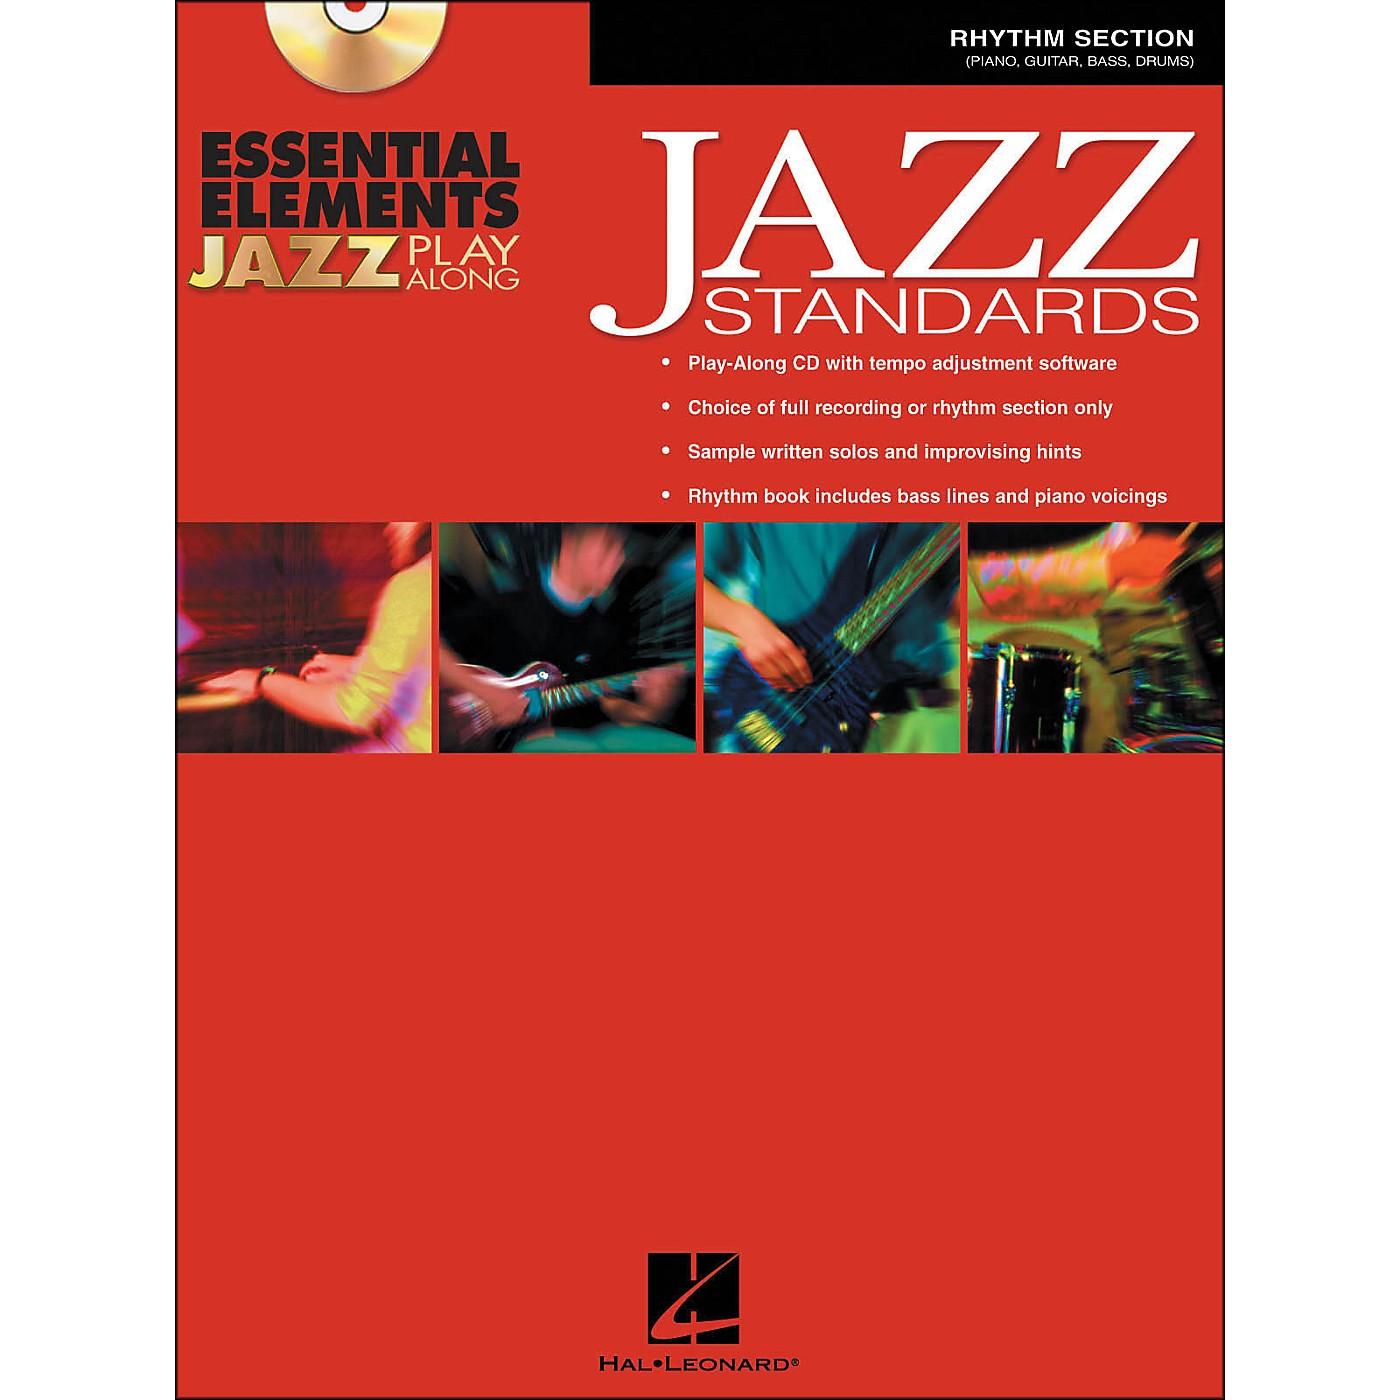 Hal Leonard EE Jazz Play Along: Jazz Standards Rhythm Section Book/CD-Rom thumbnail